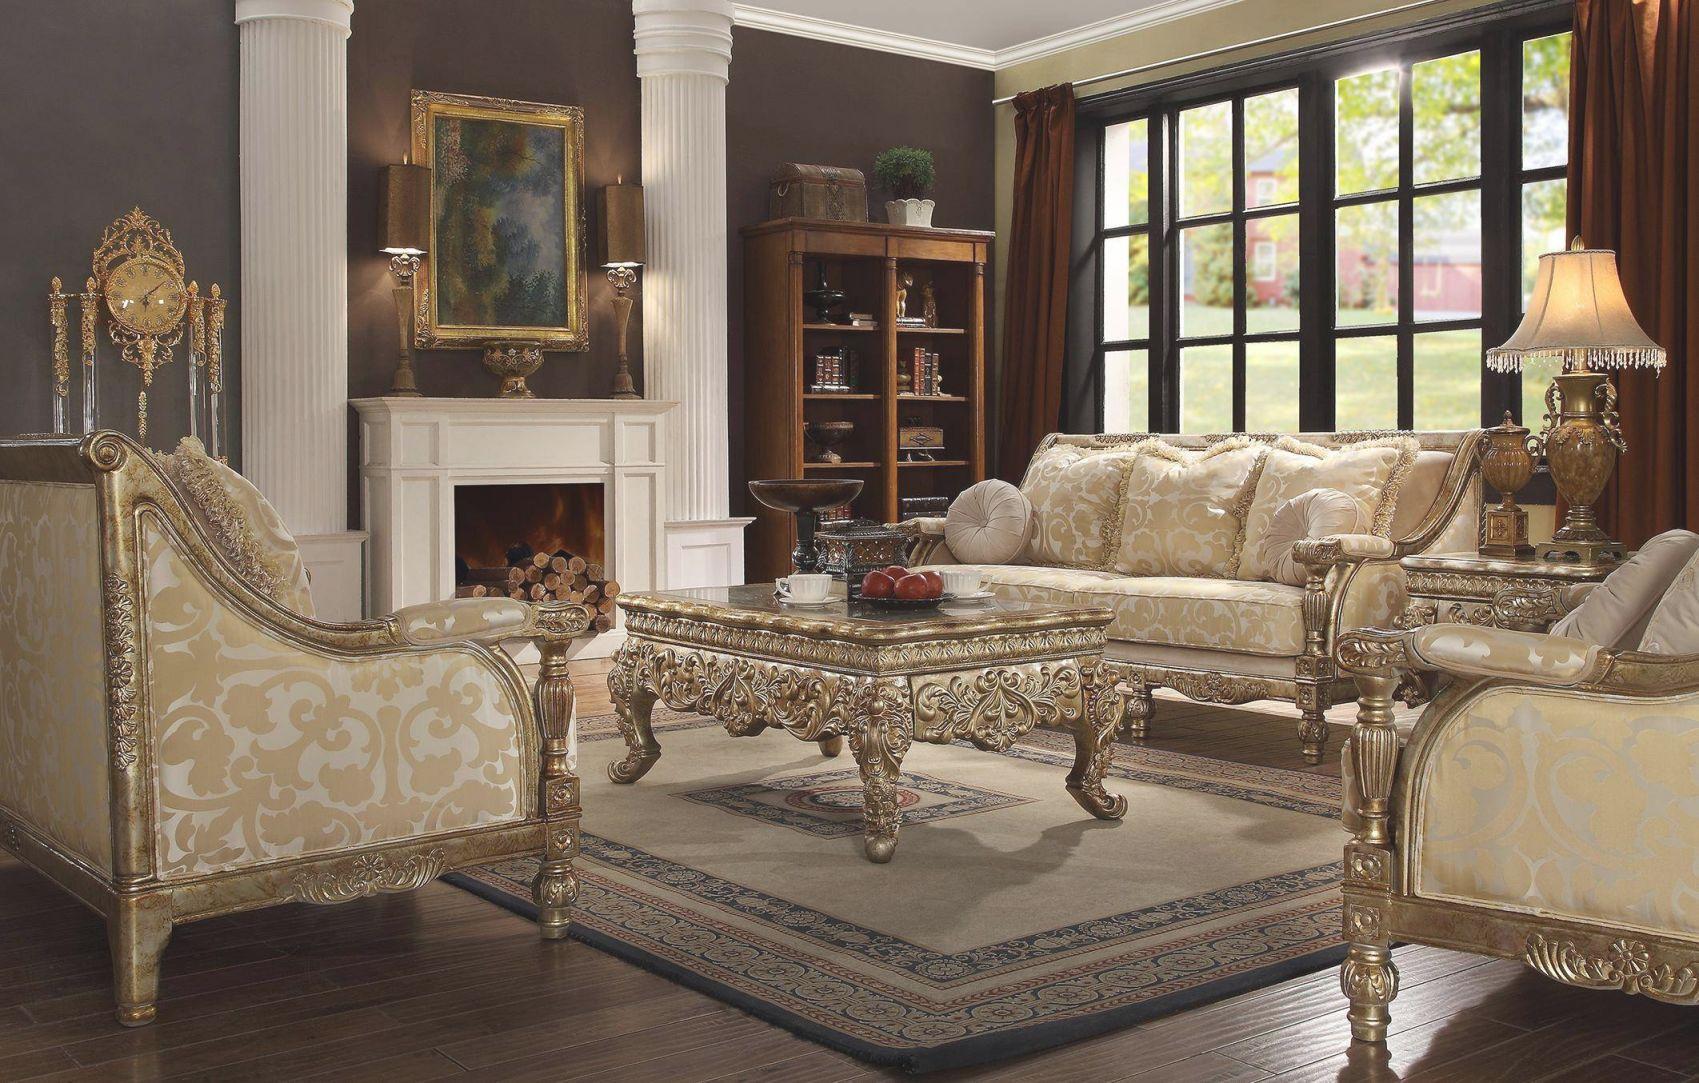 Homey Design Hd-205 Antique Gold Finish Victorian Living regarding Victorian Living Room Furniture